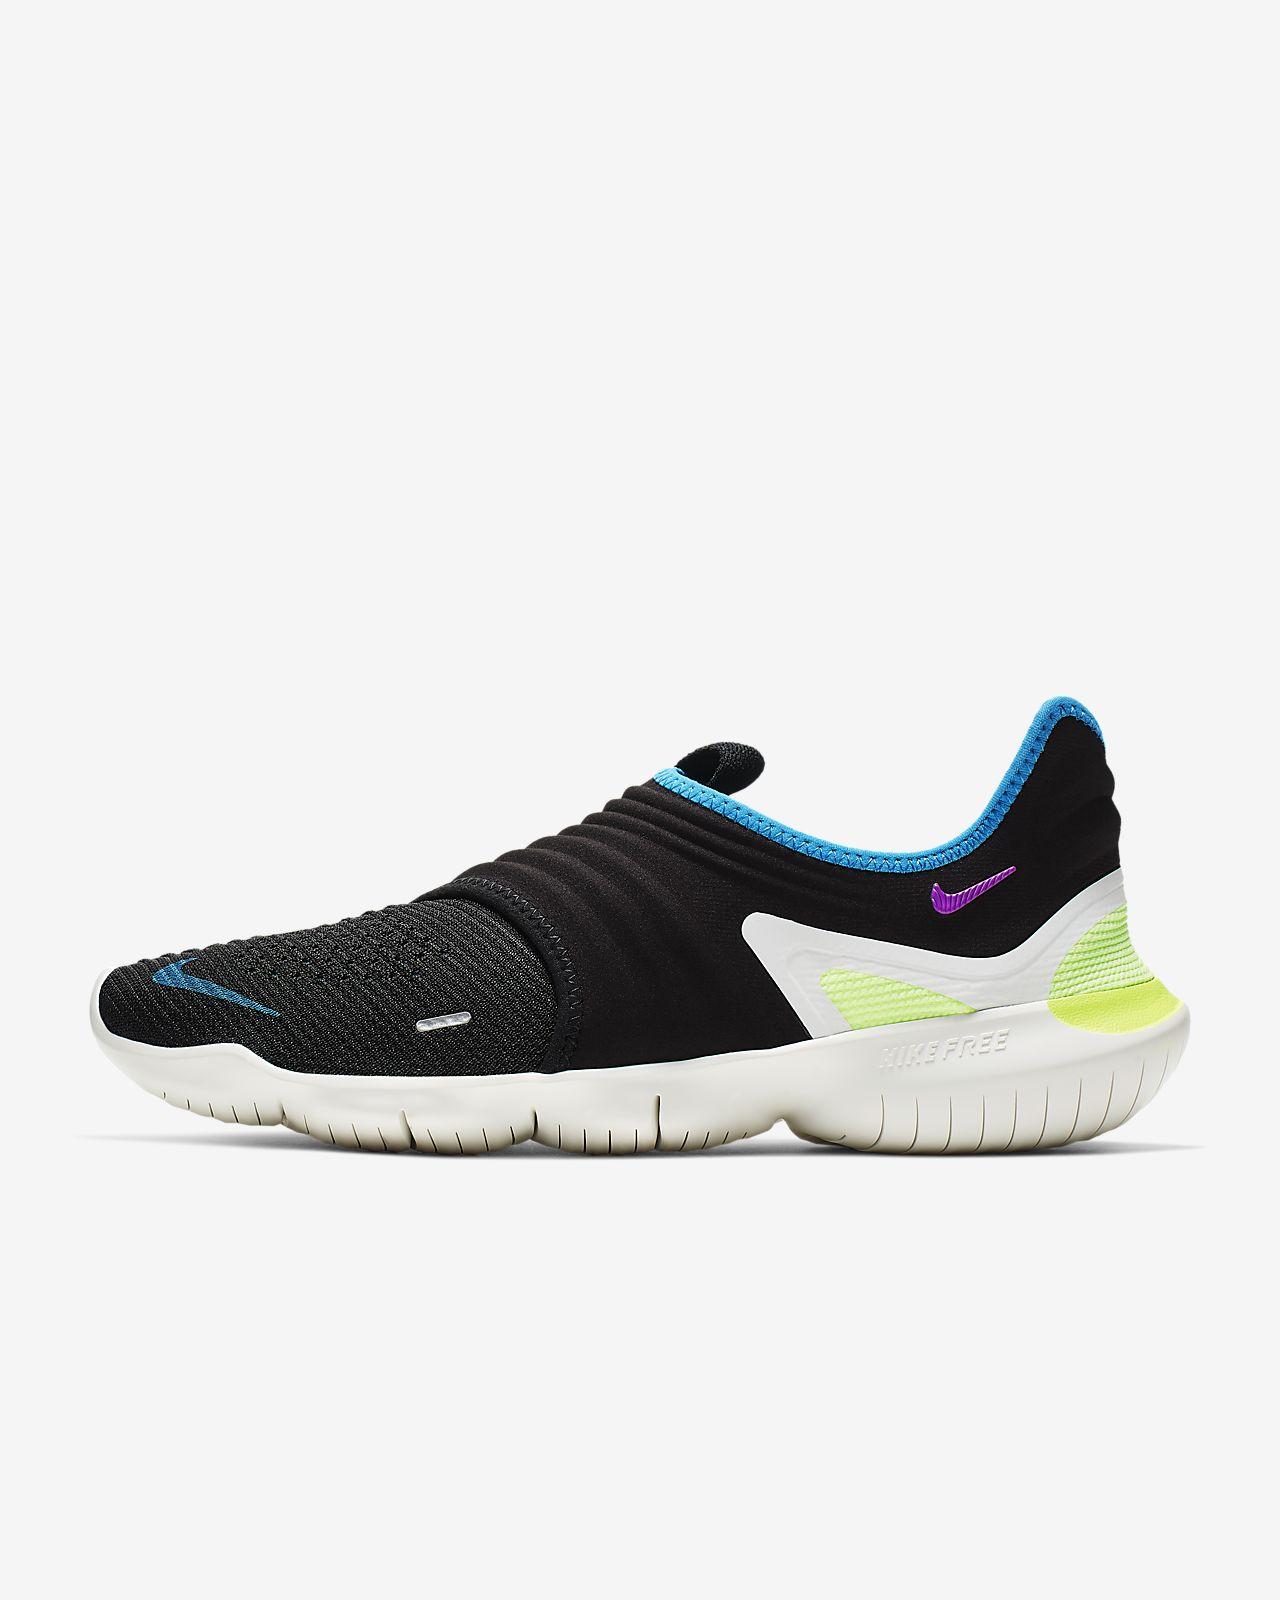 efd4cc4cb2d4 Nike Free RN Flyknit 3.0 Men s Running Shoe. Nike.com NO